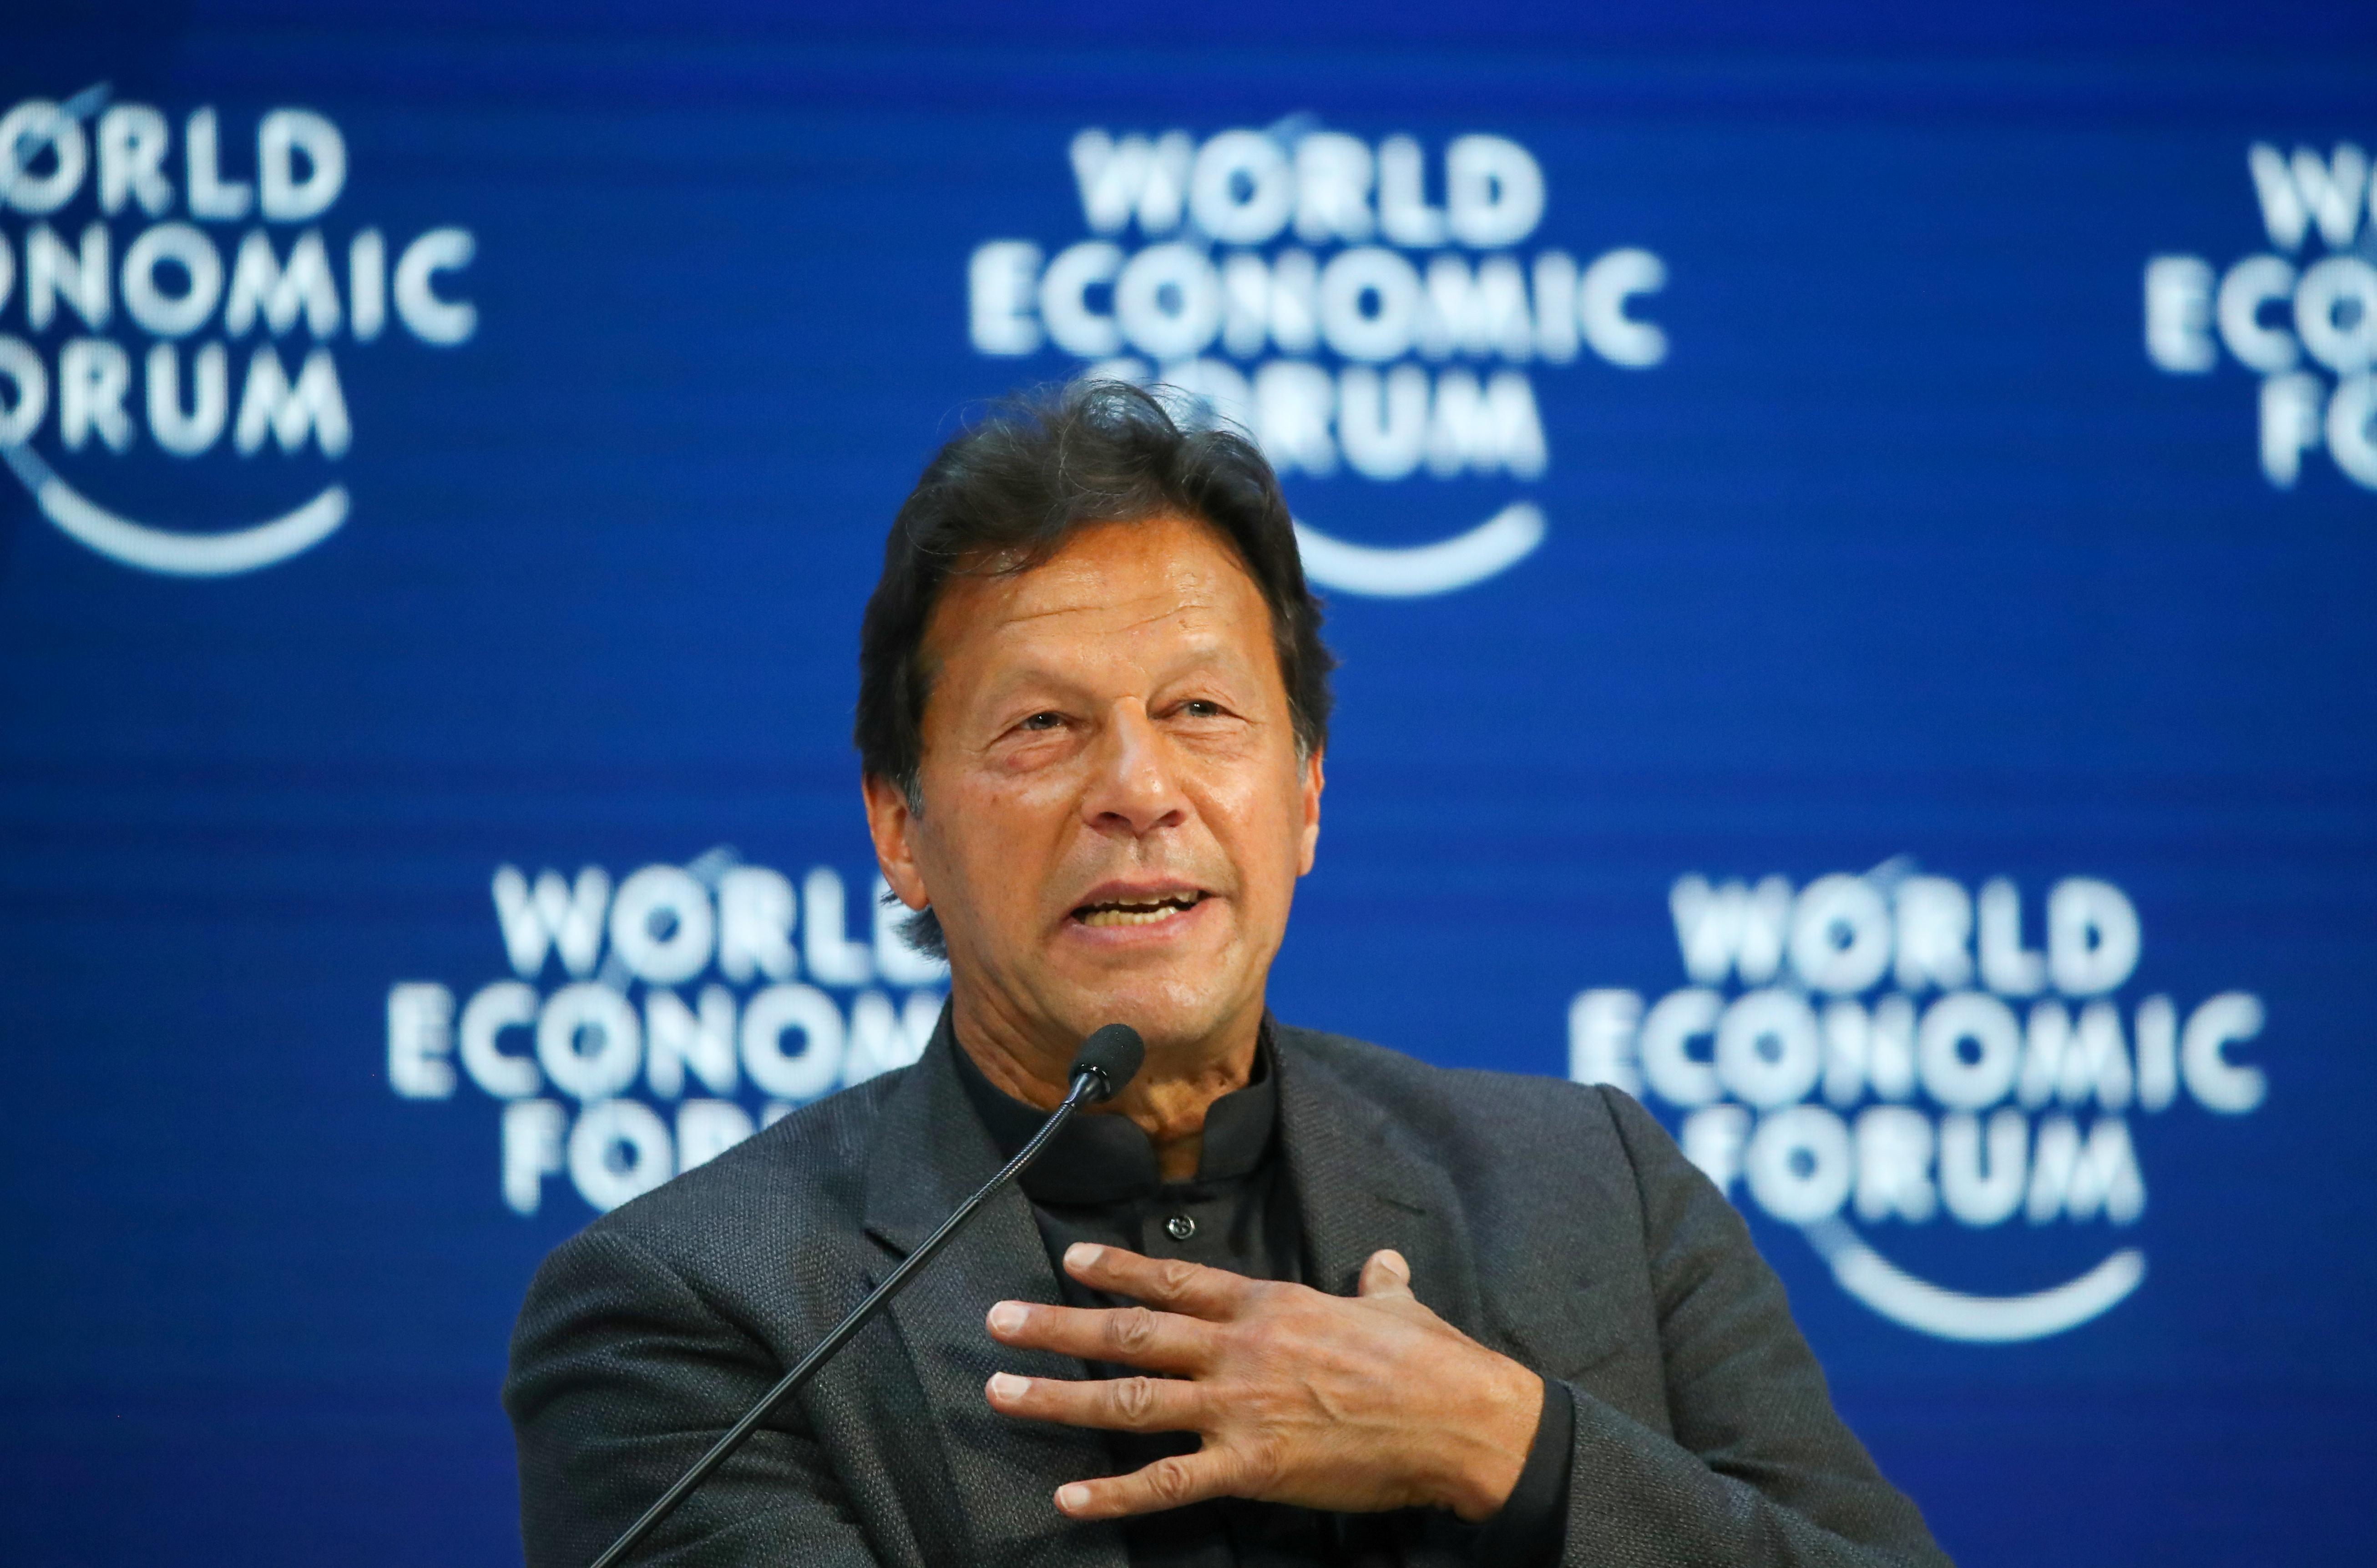 Pakistan's Imran Khan calls for U.N. action on India dispute